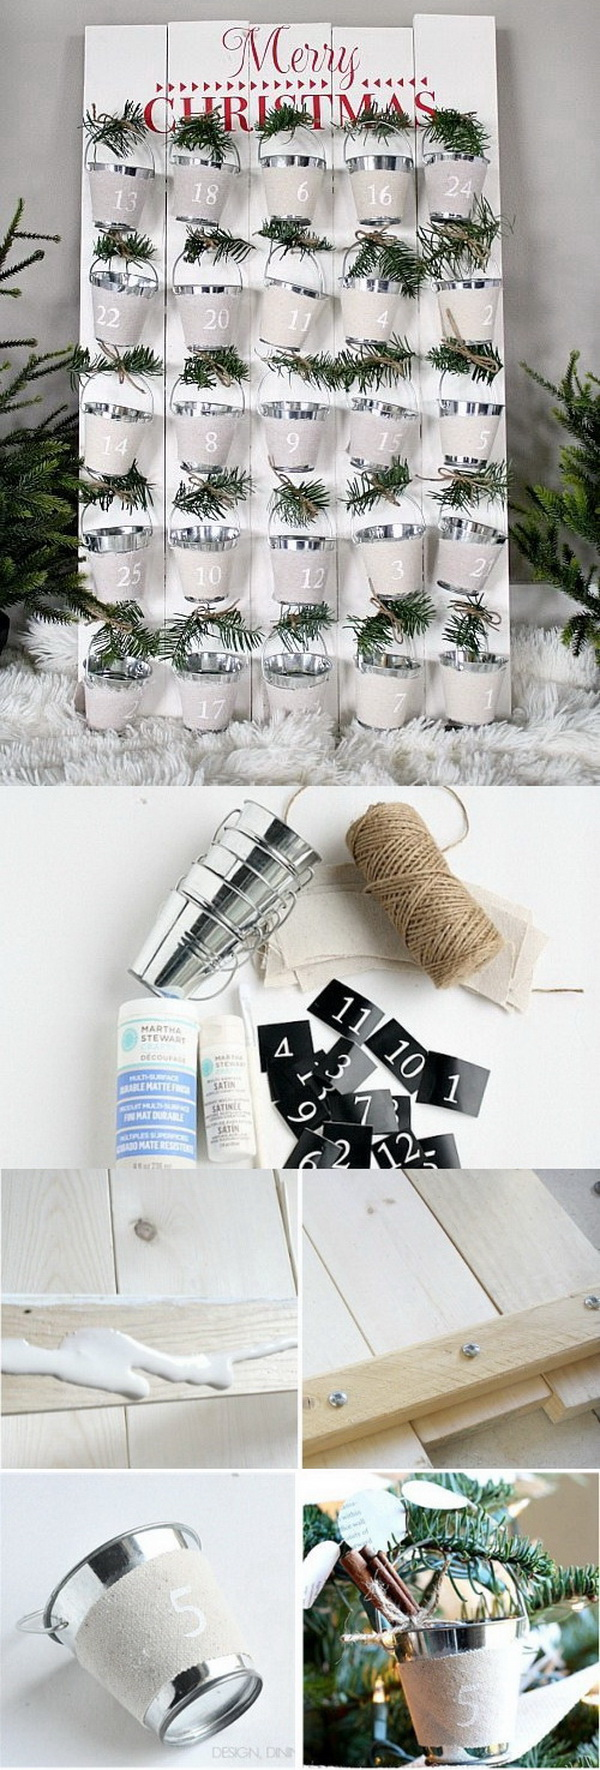 DIY Advent Calendar With Bucket Pails.